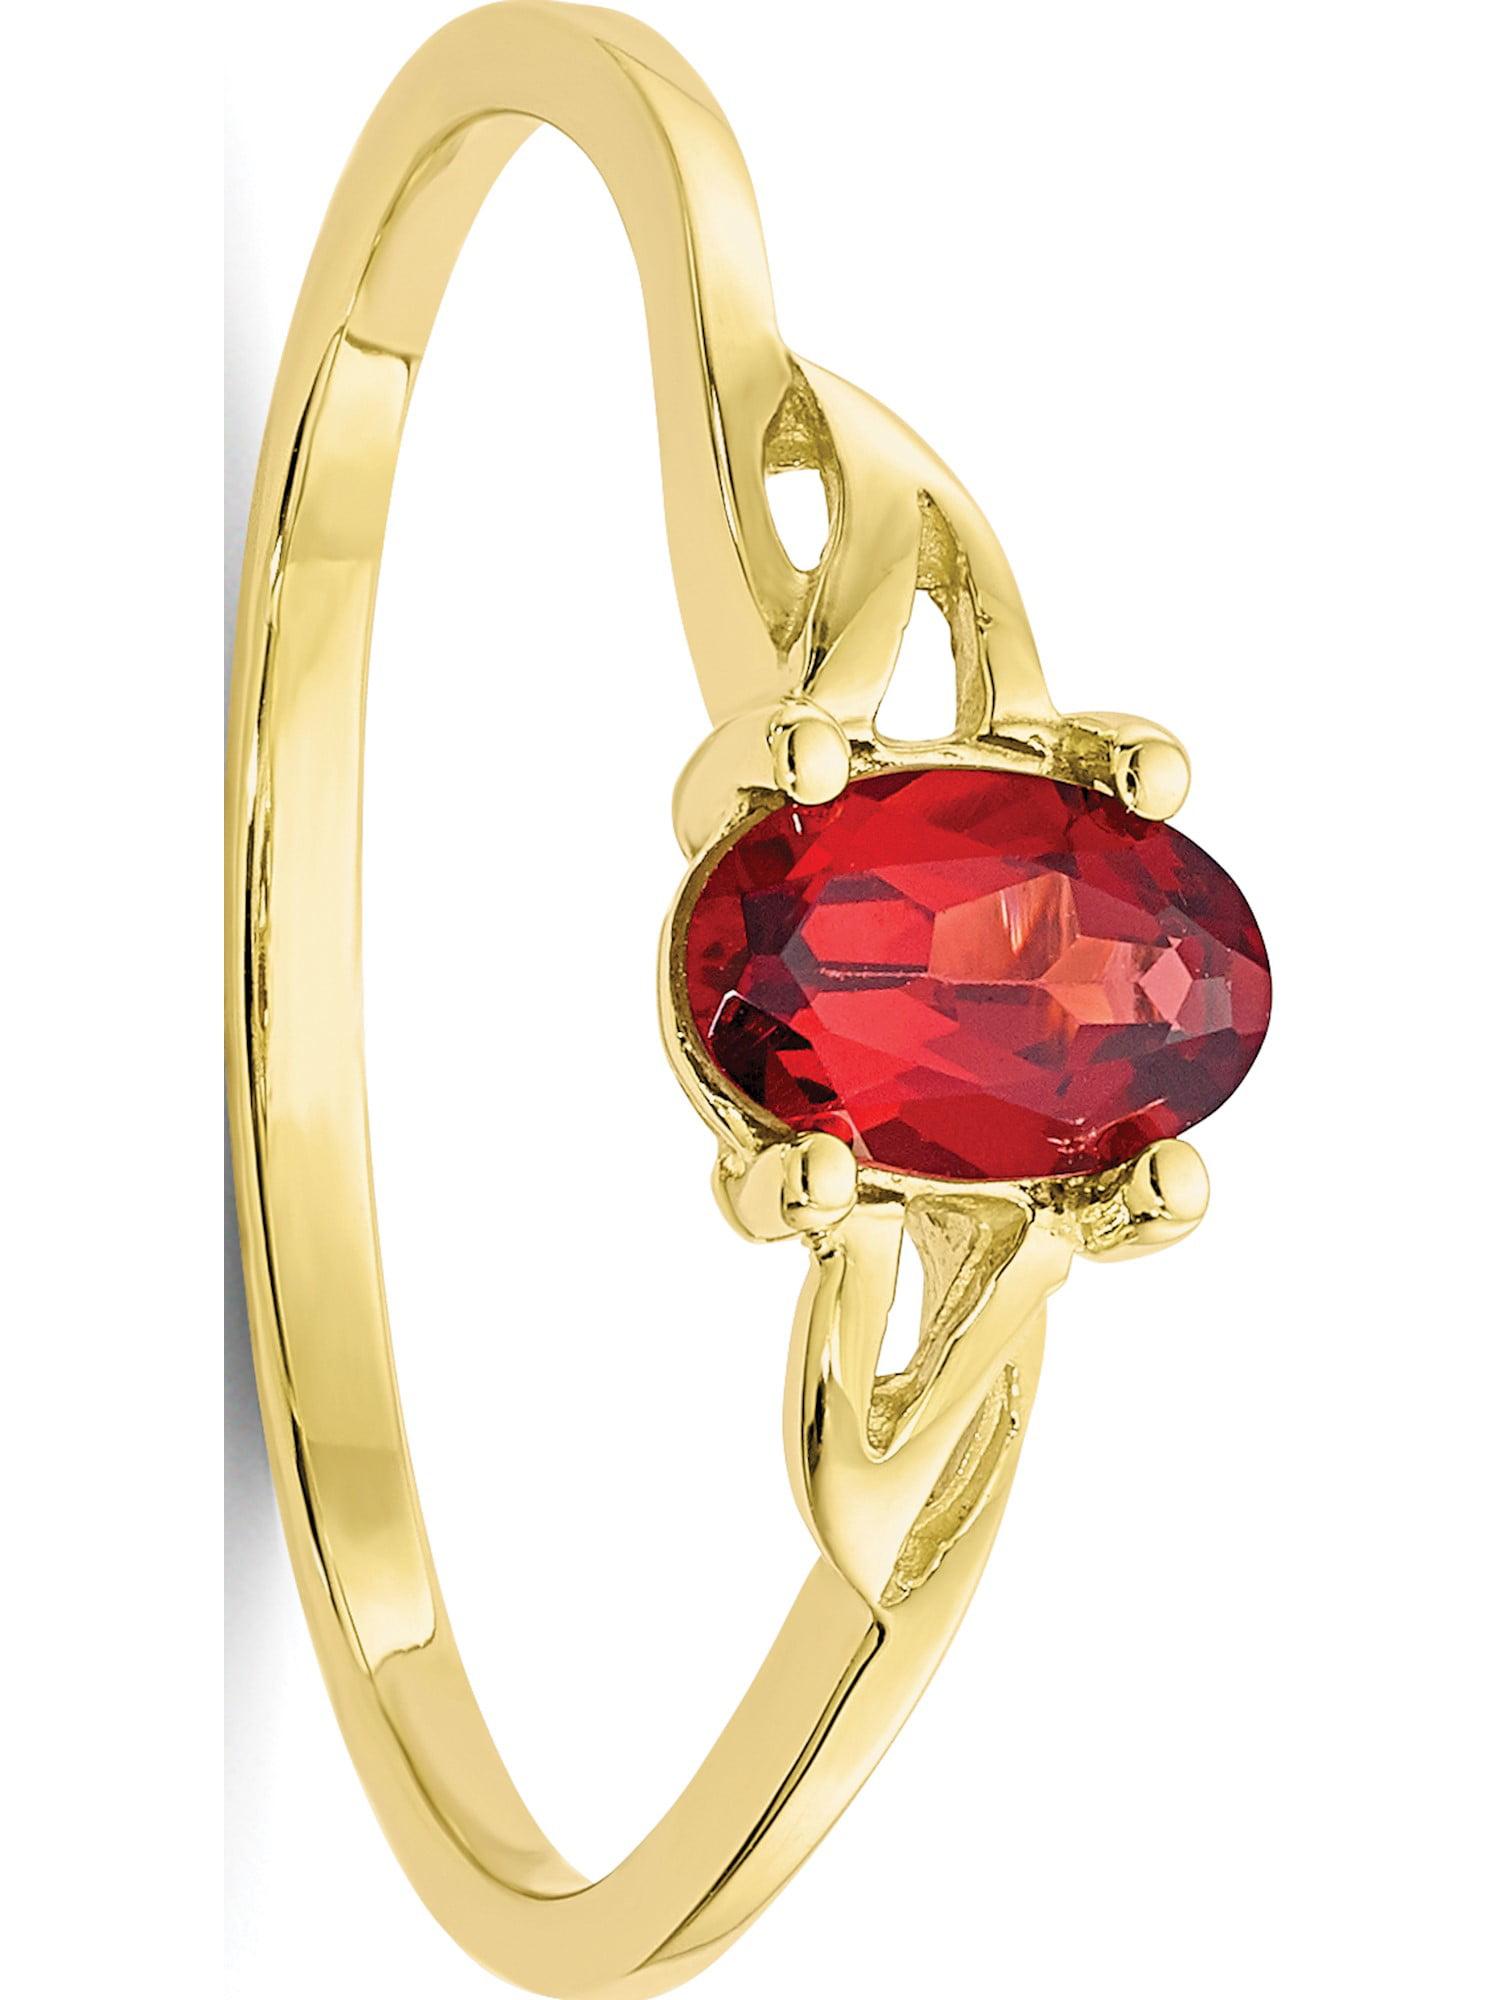 10k Yellow Gold Polished Geniune Garnet Birthstone Ring by